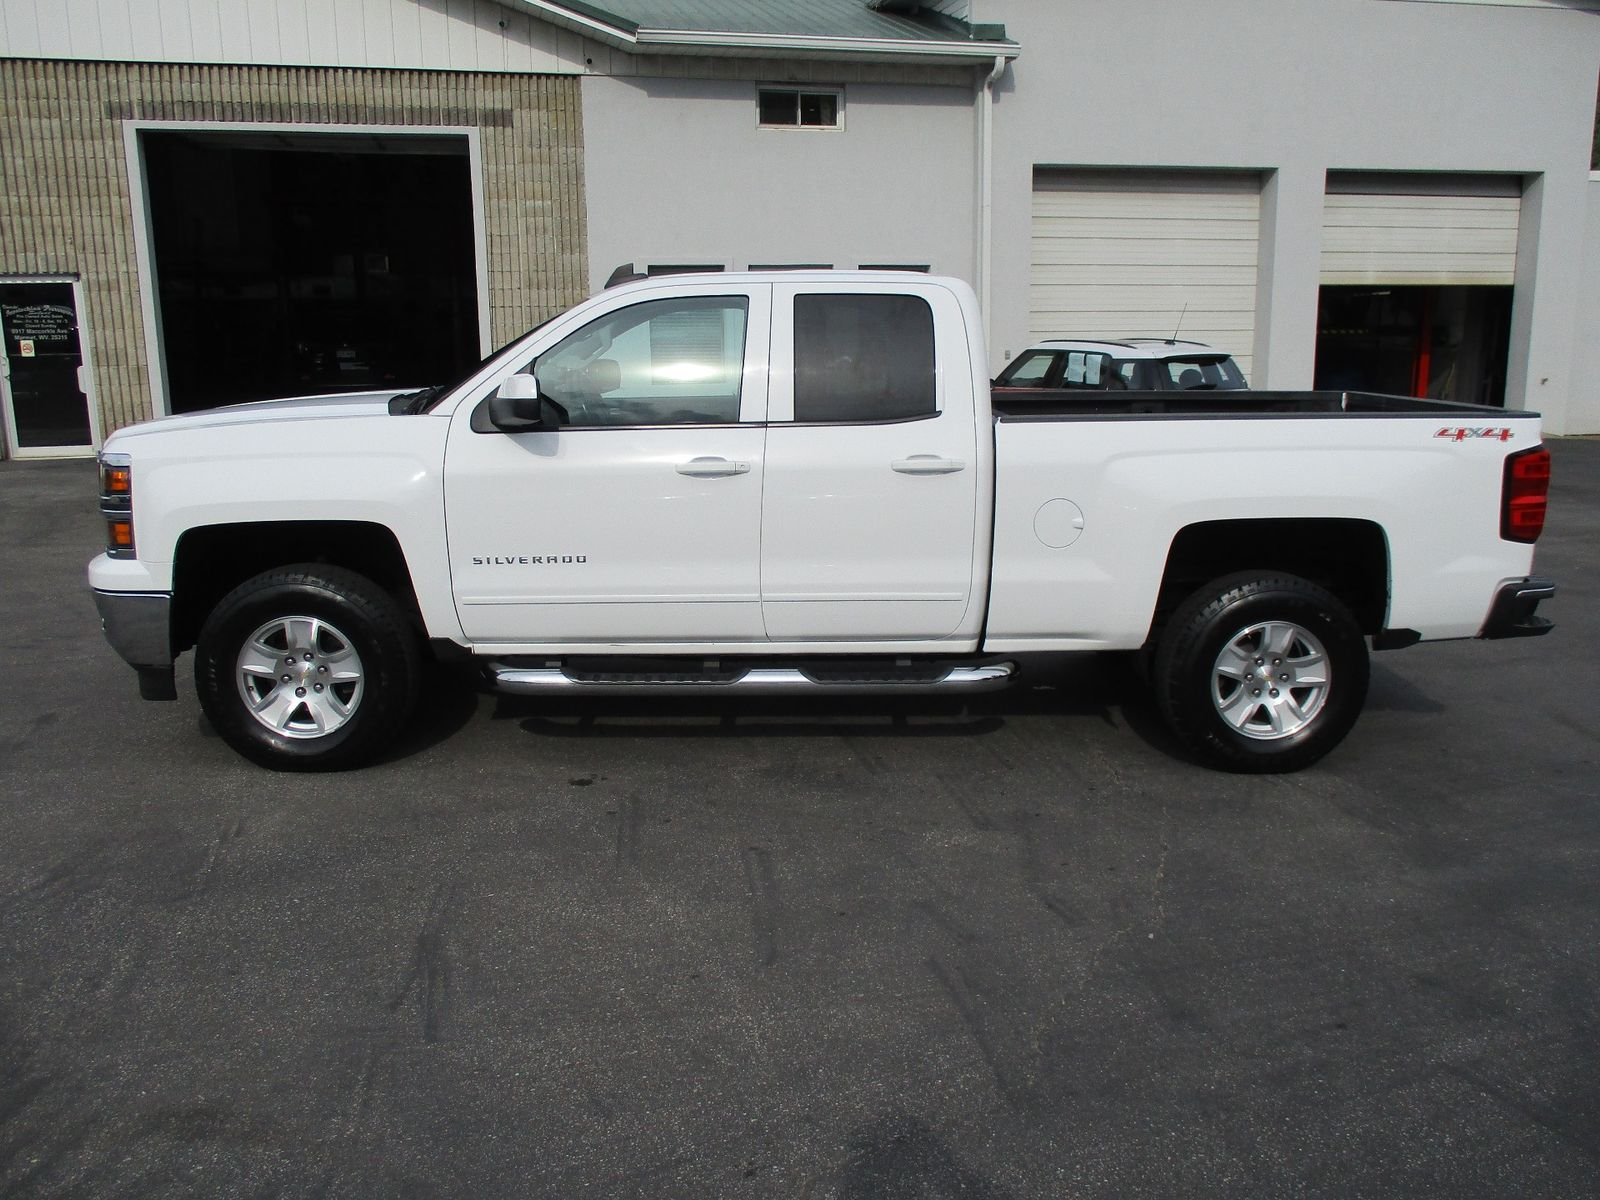 silverado saddles chevrolet news high hd country h for trucks up